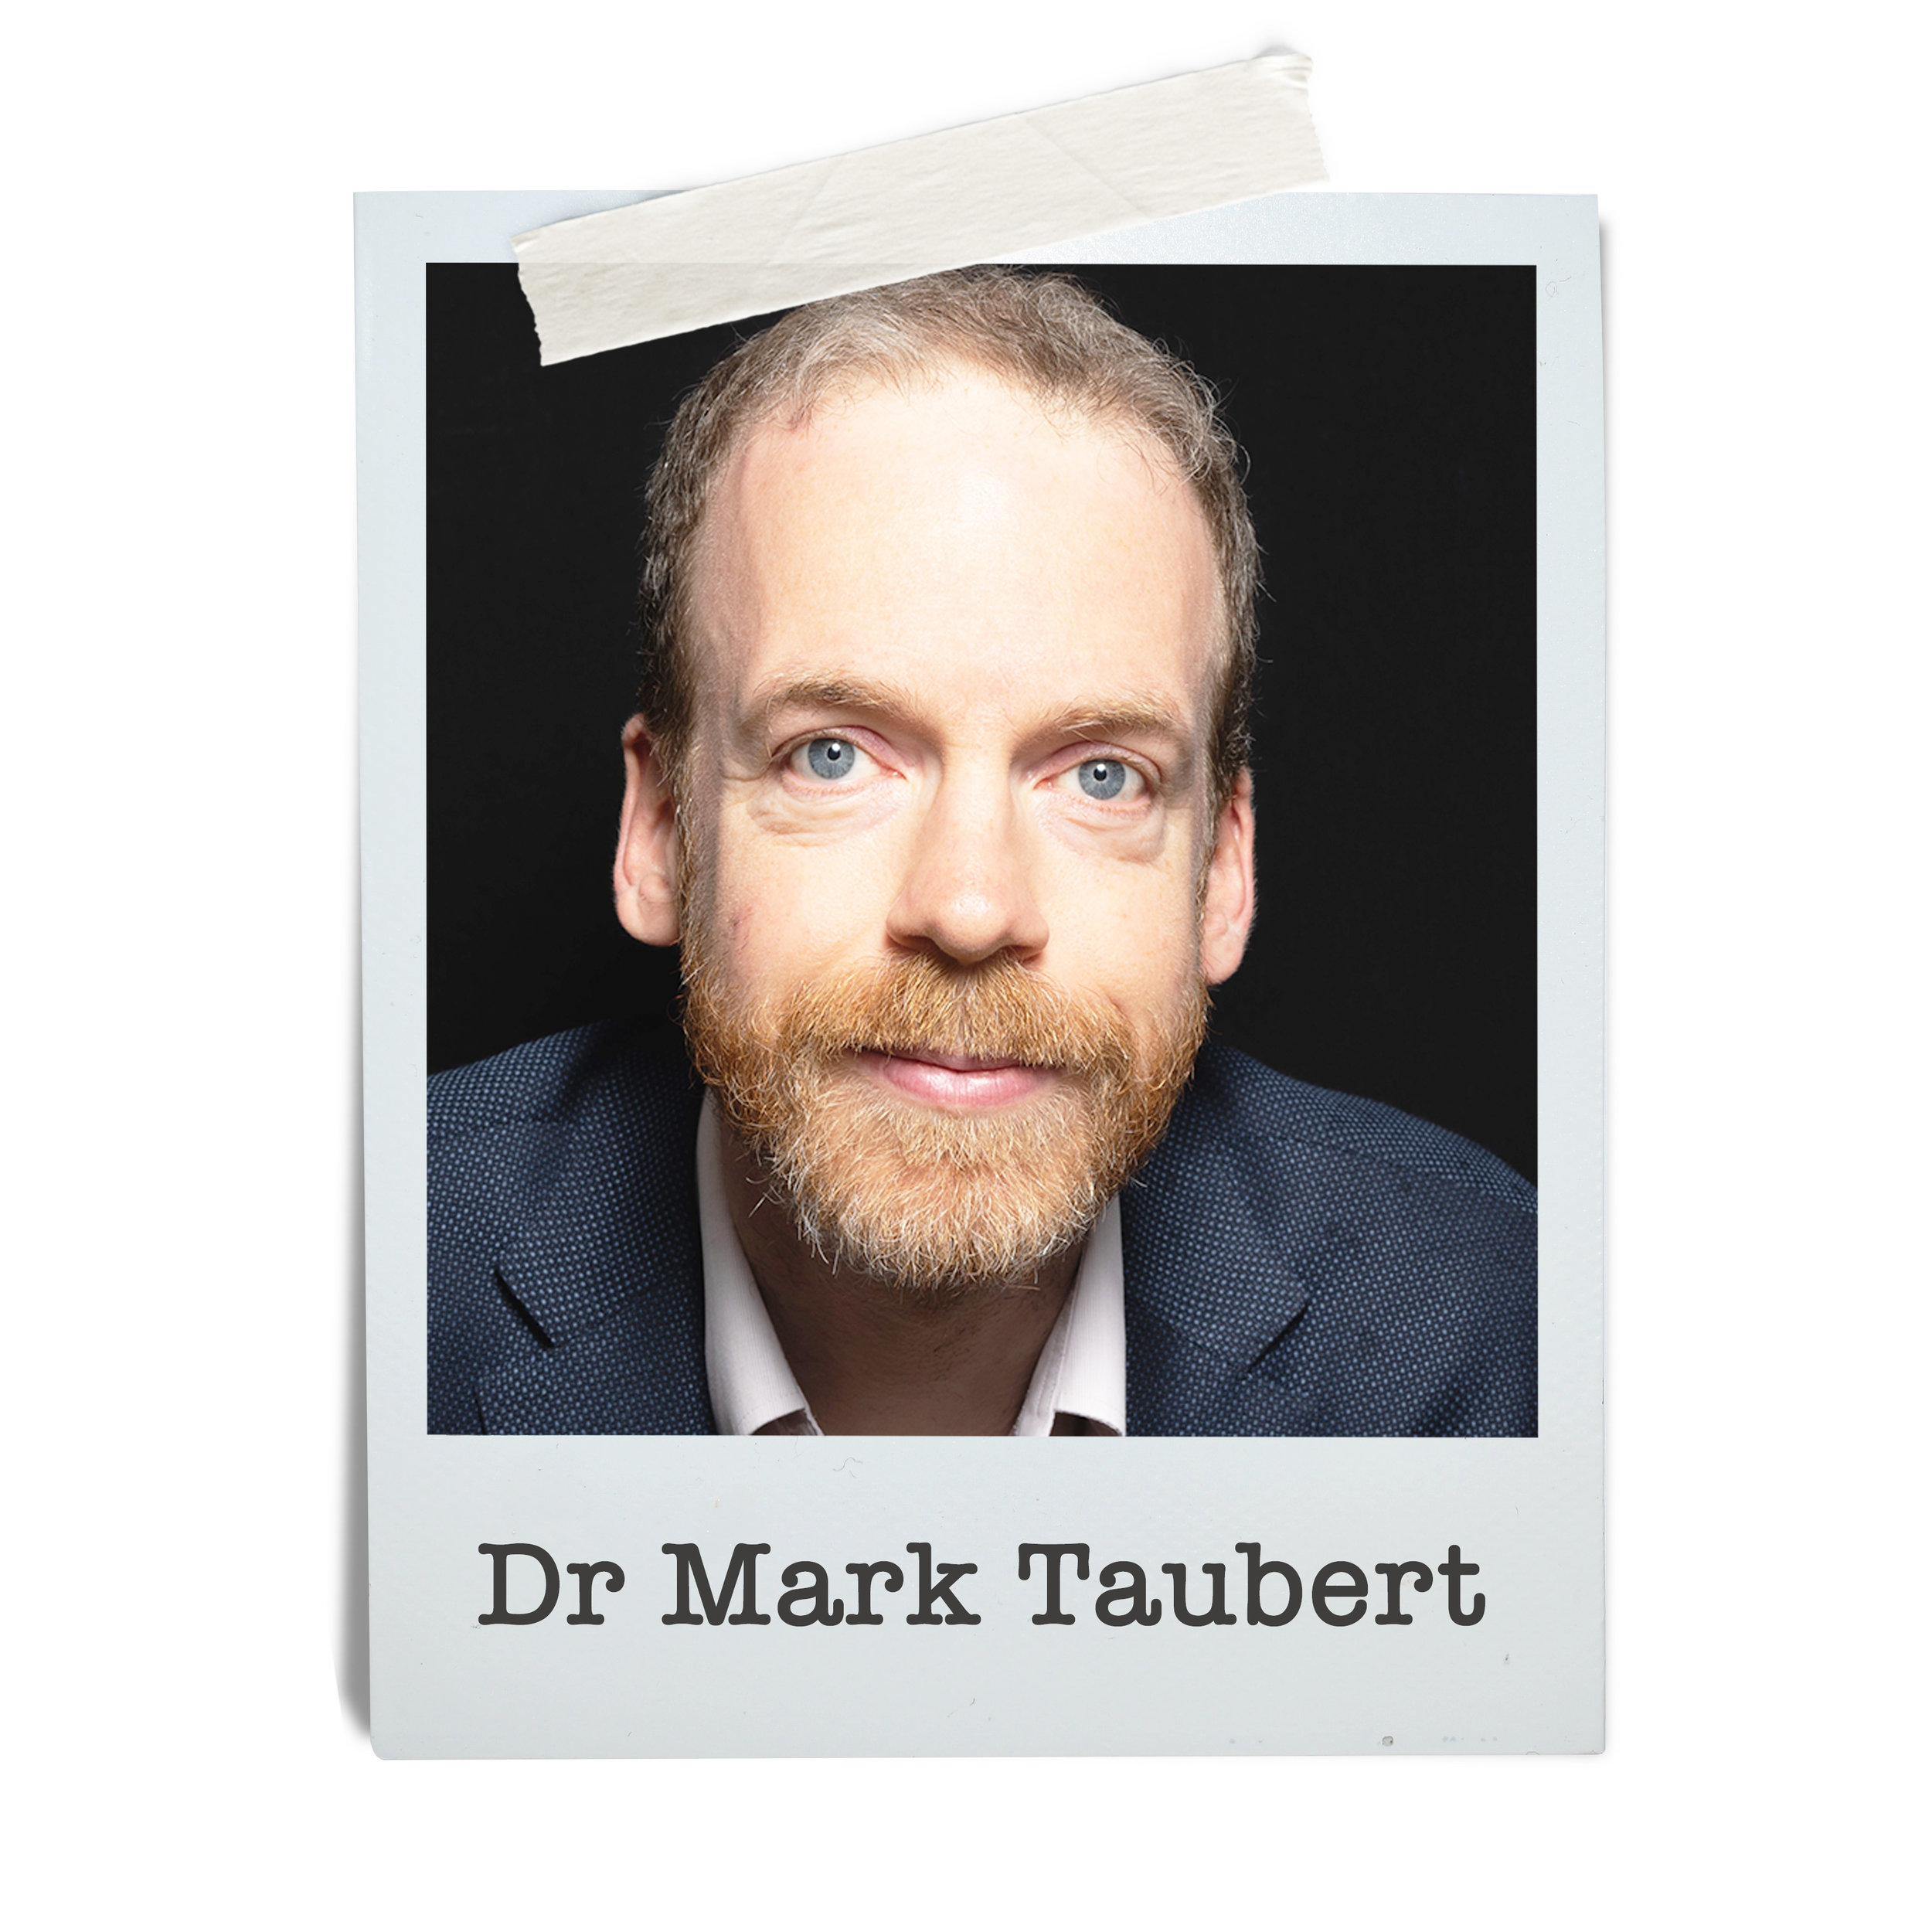 Dr Mark Taubert